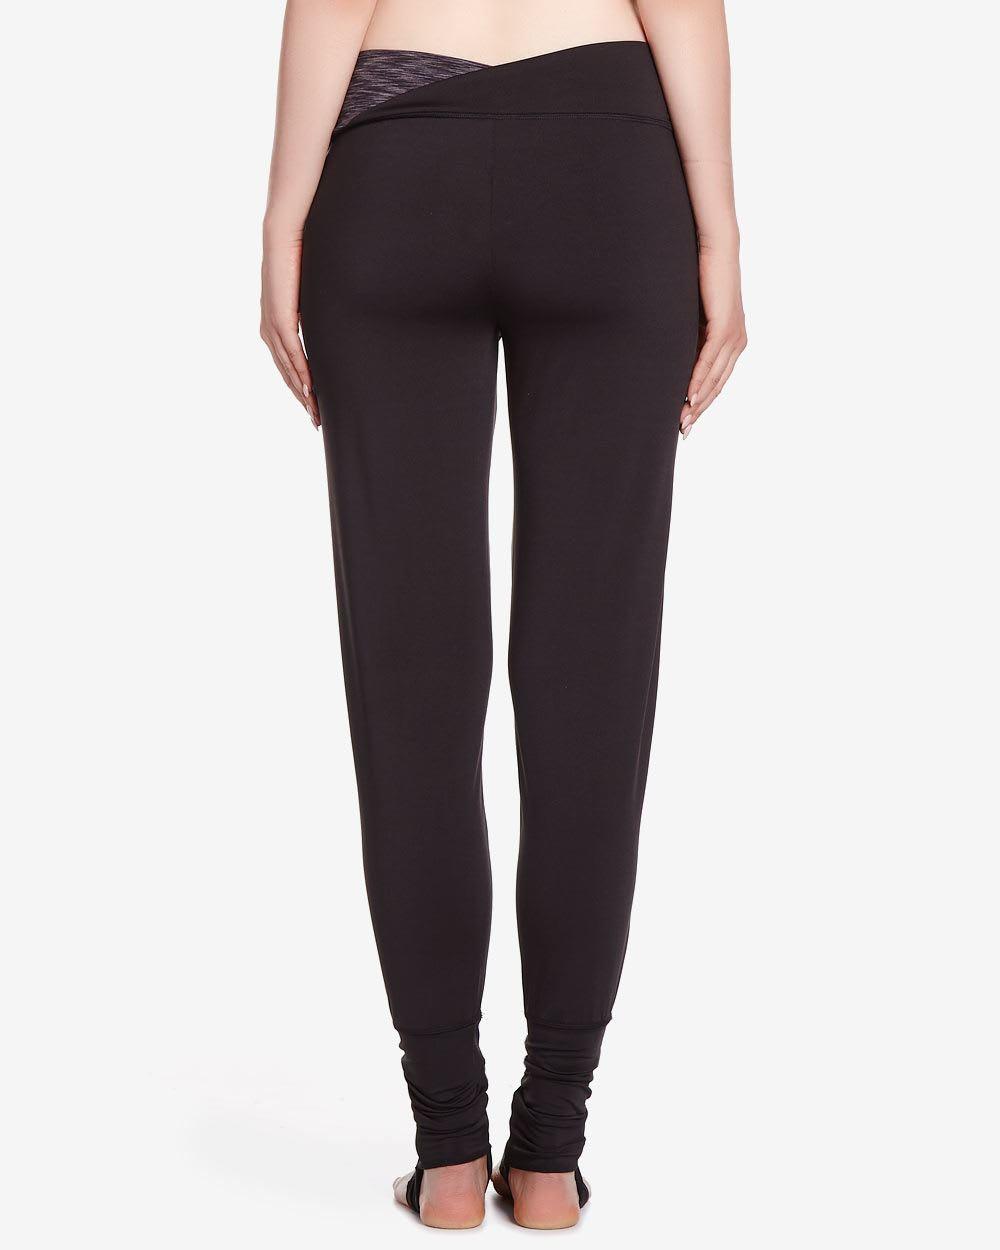 Hyba Loose Fit Yoga Pants